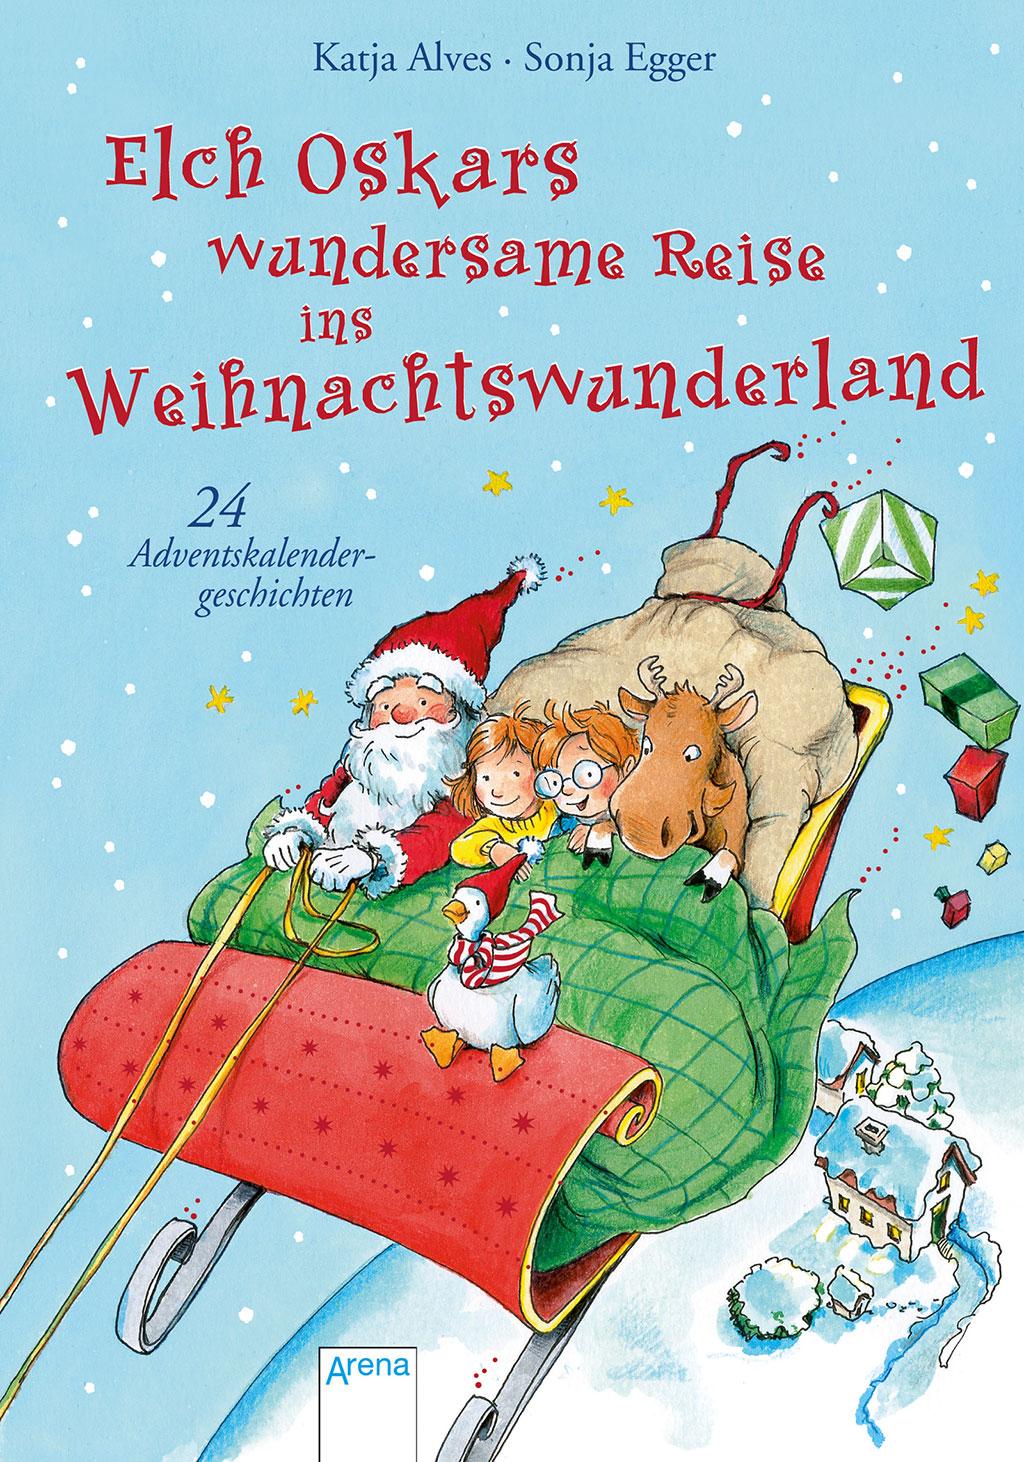 katja alves, elch oskars wundersame reise ins weihnachtswunderland